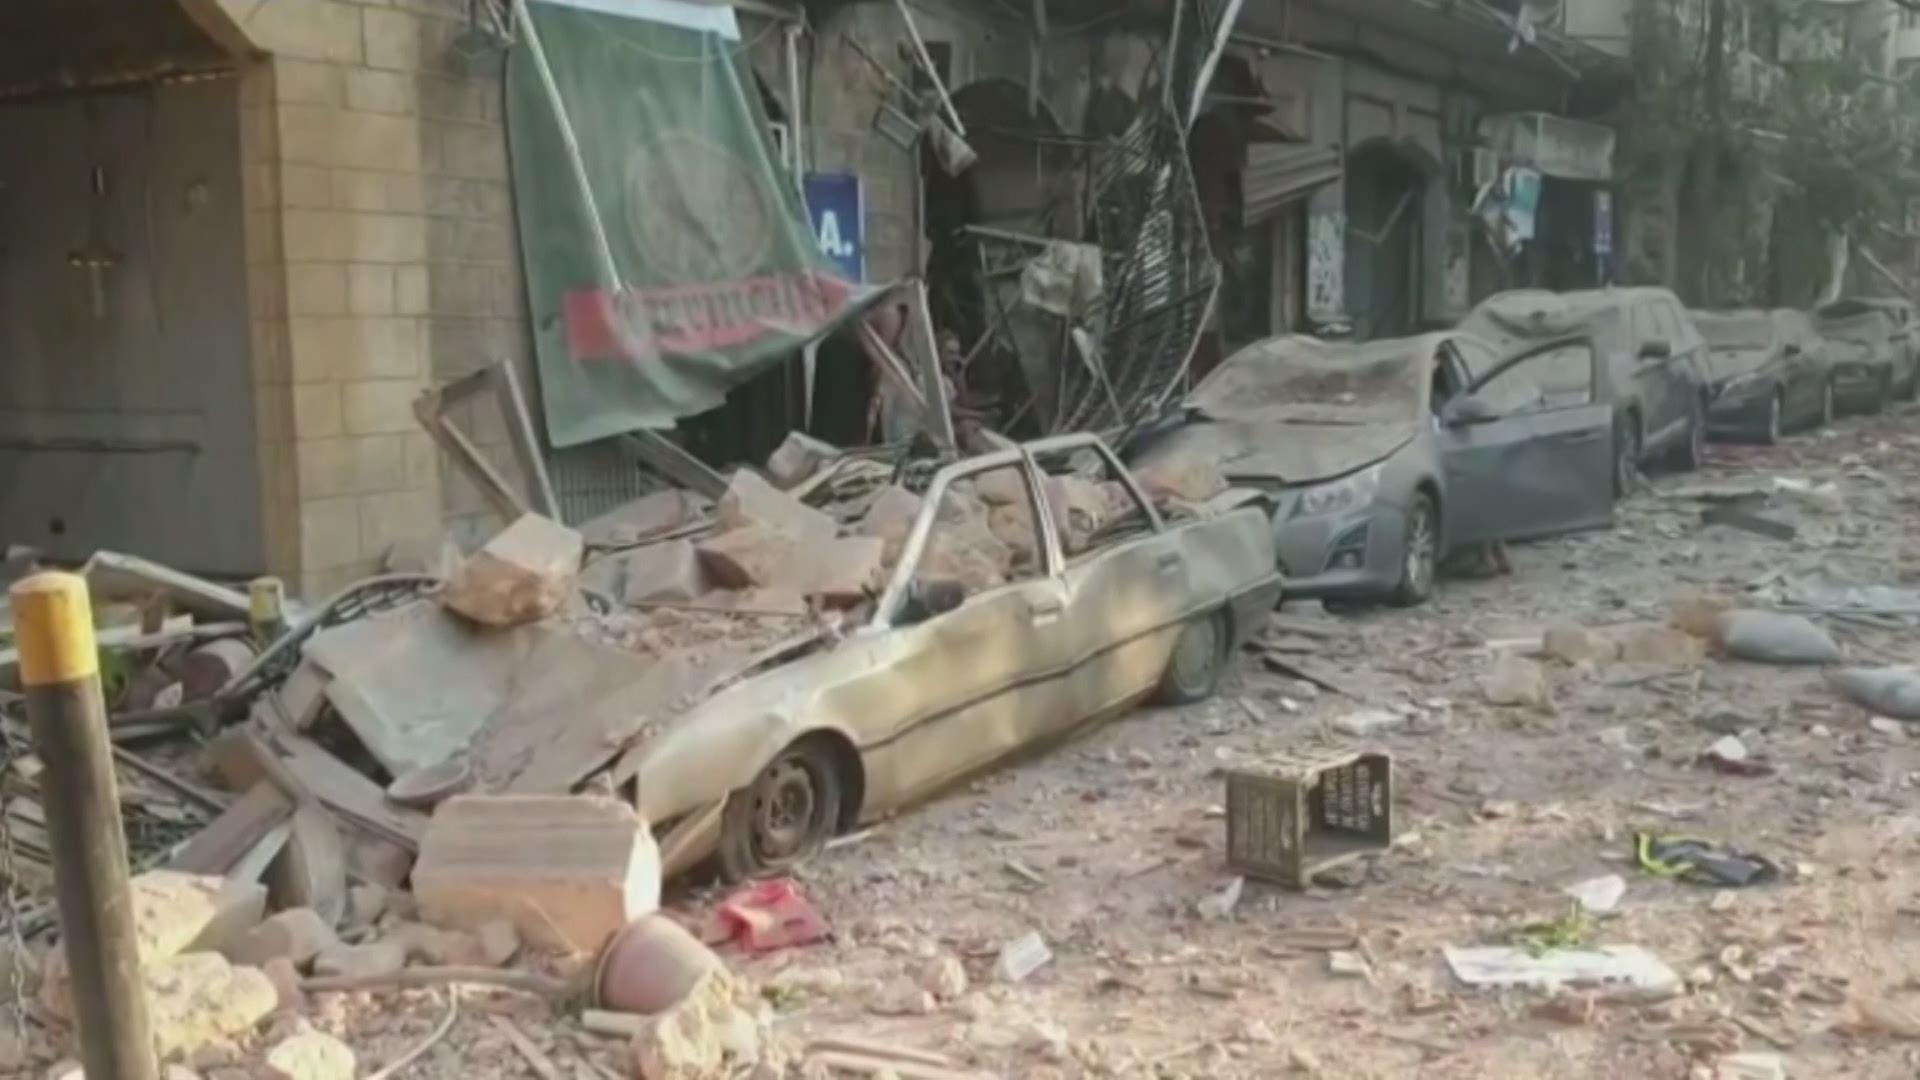 Massive explosion reported in Lebanon's capital Beirut   wfaa.com